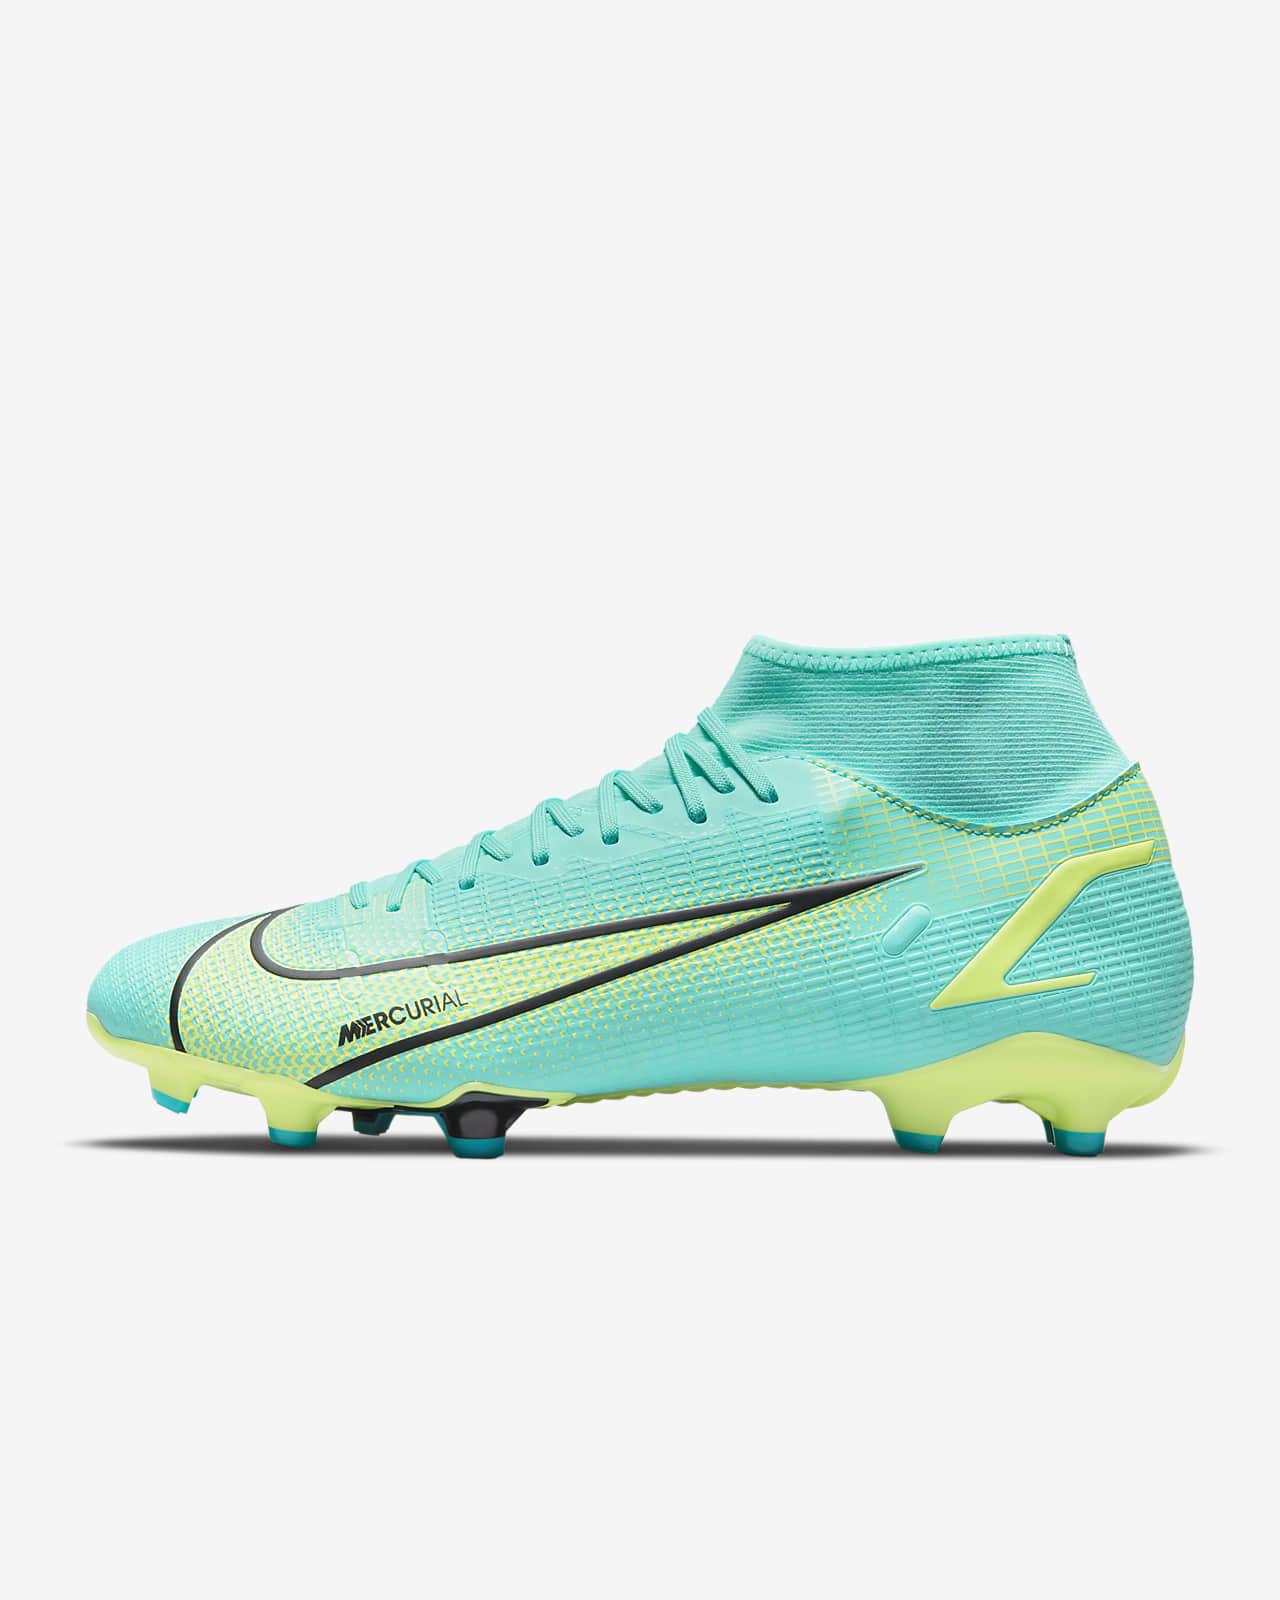 Nike Mercurial Superfly 8 Academy MG Multi-Ground Football Boot